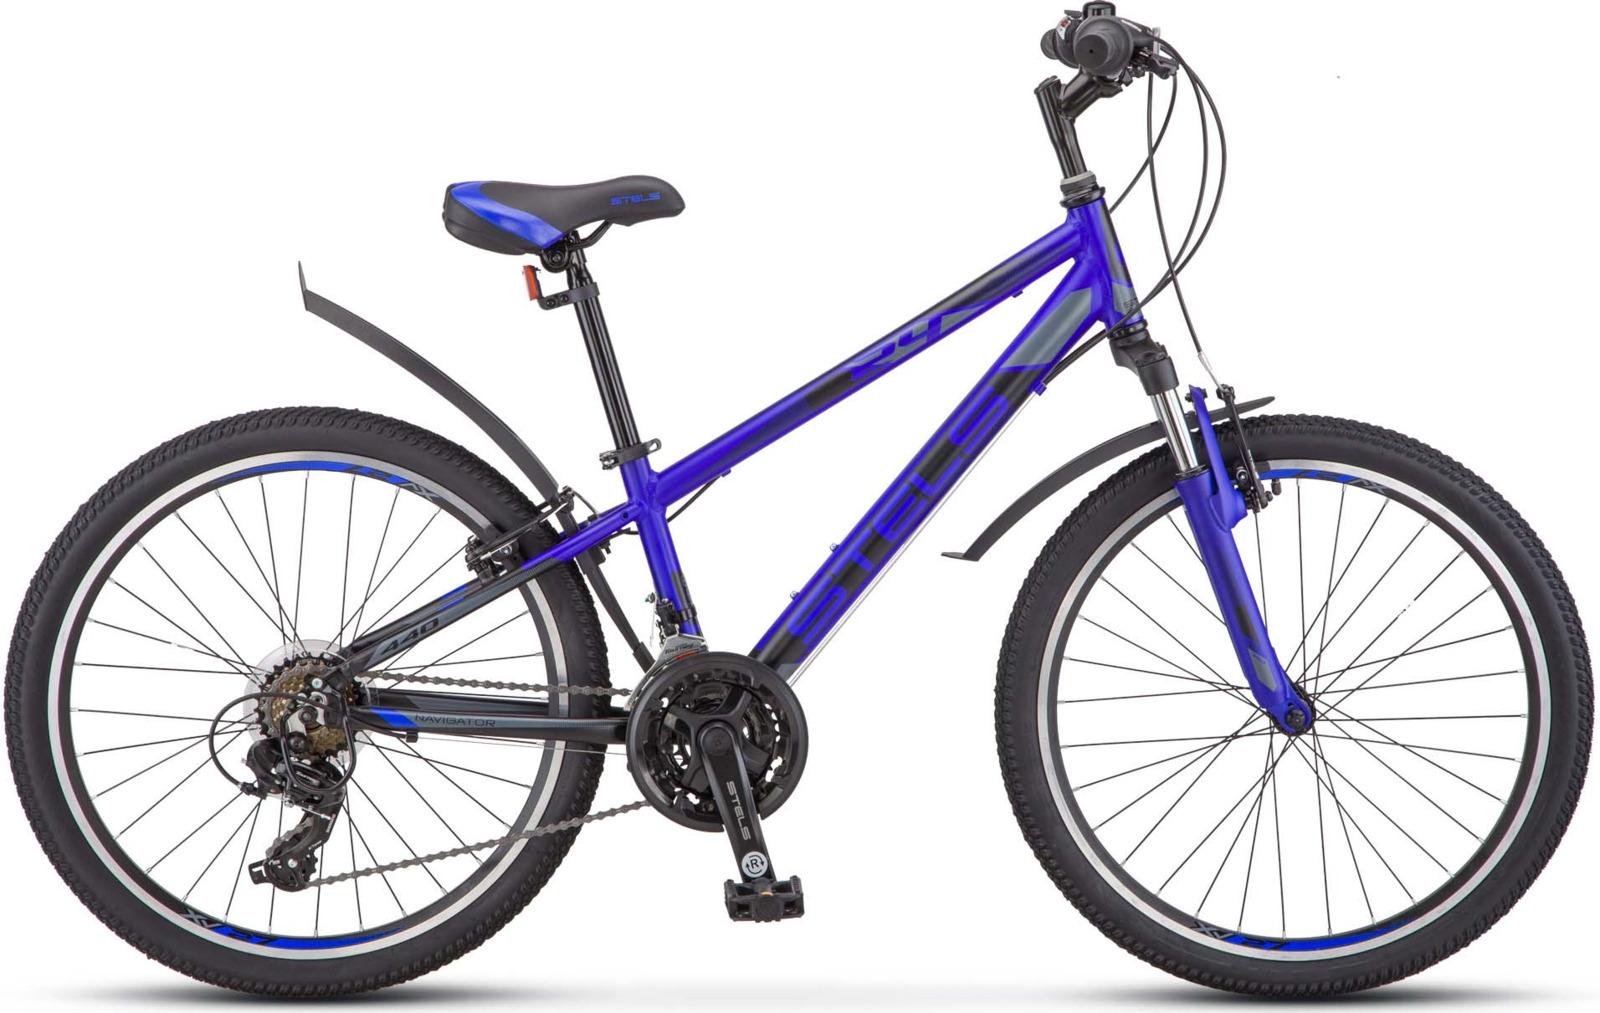 Велосипед Stels Navigator-440 V 13, KUBC0049812018, синий велосипед stels navigator 610 v v030 2018